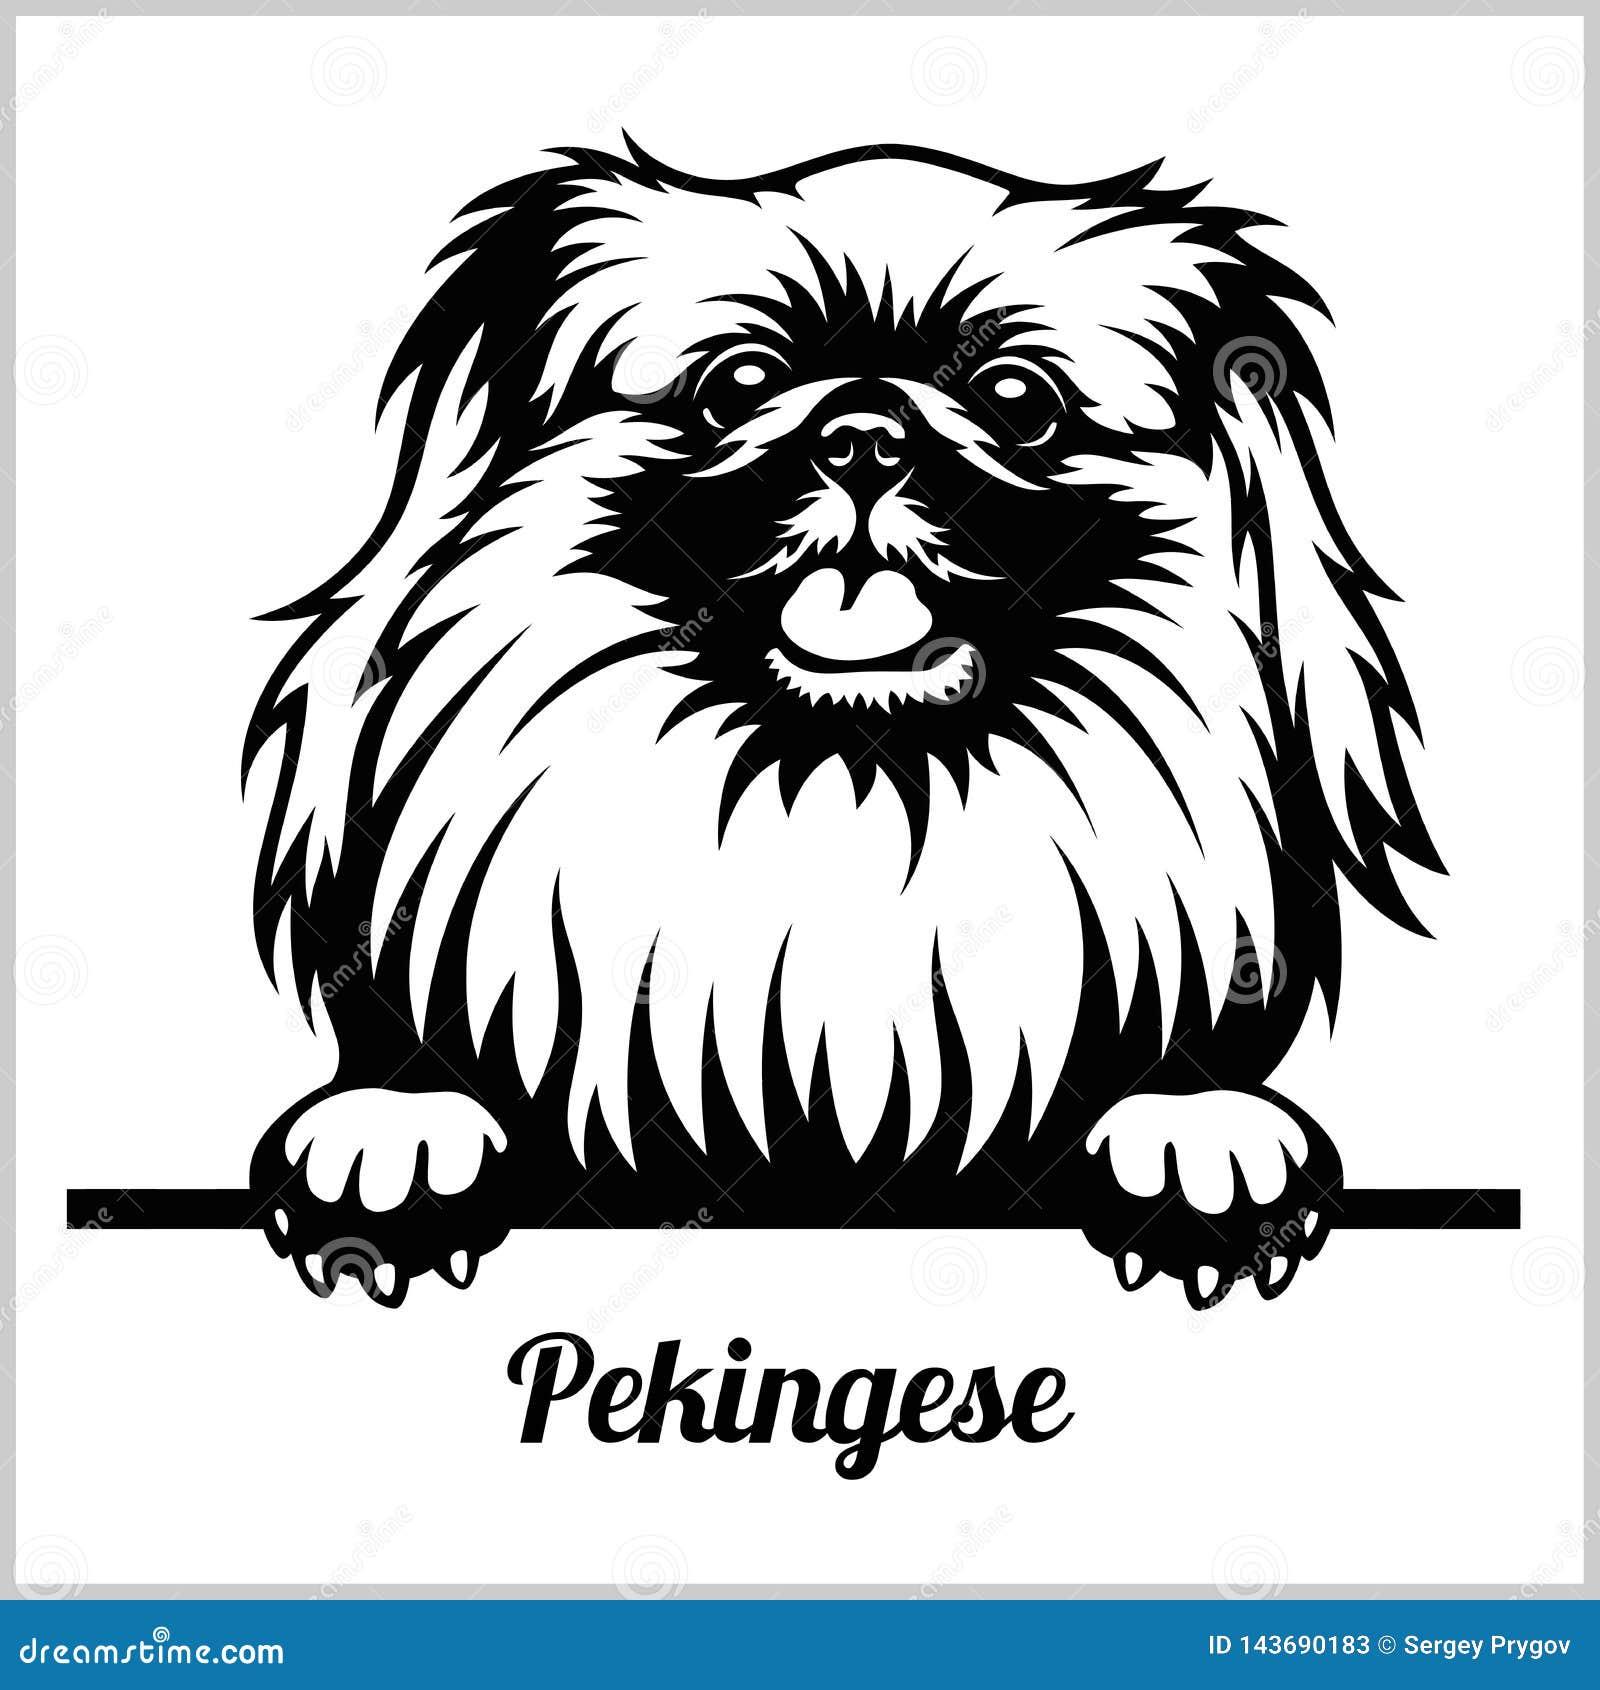 Pekingese Cartoons Illustrations Amp Vector Stock Images